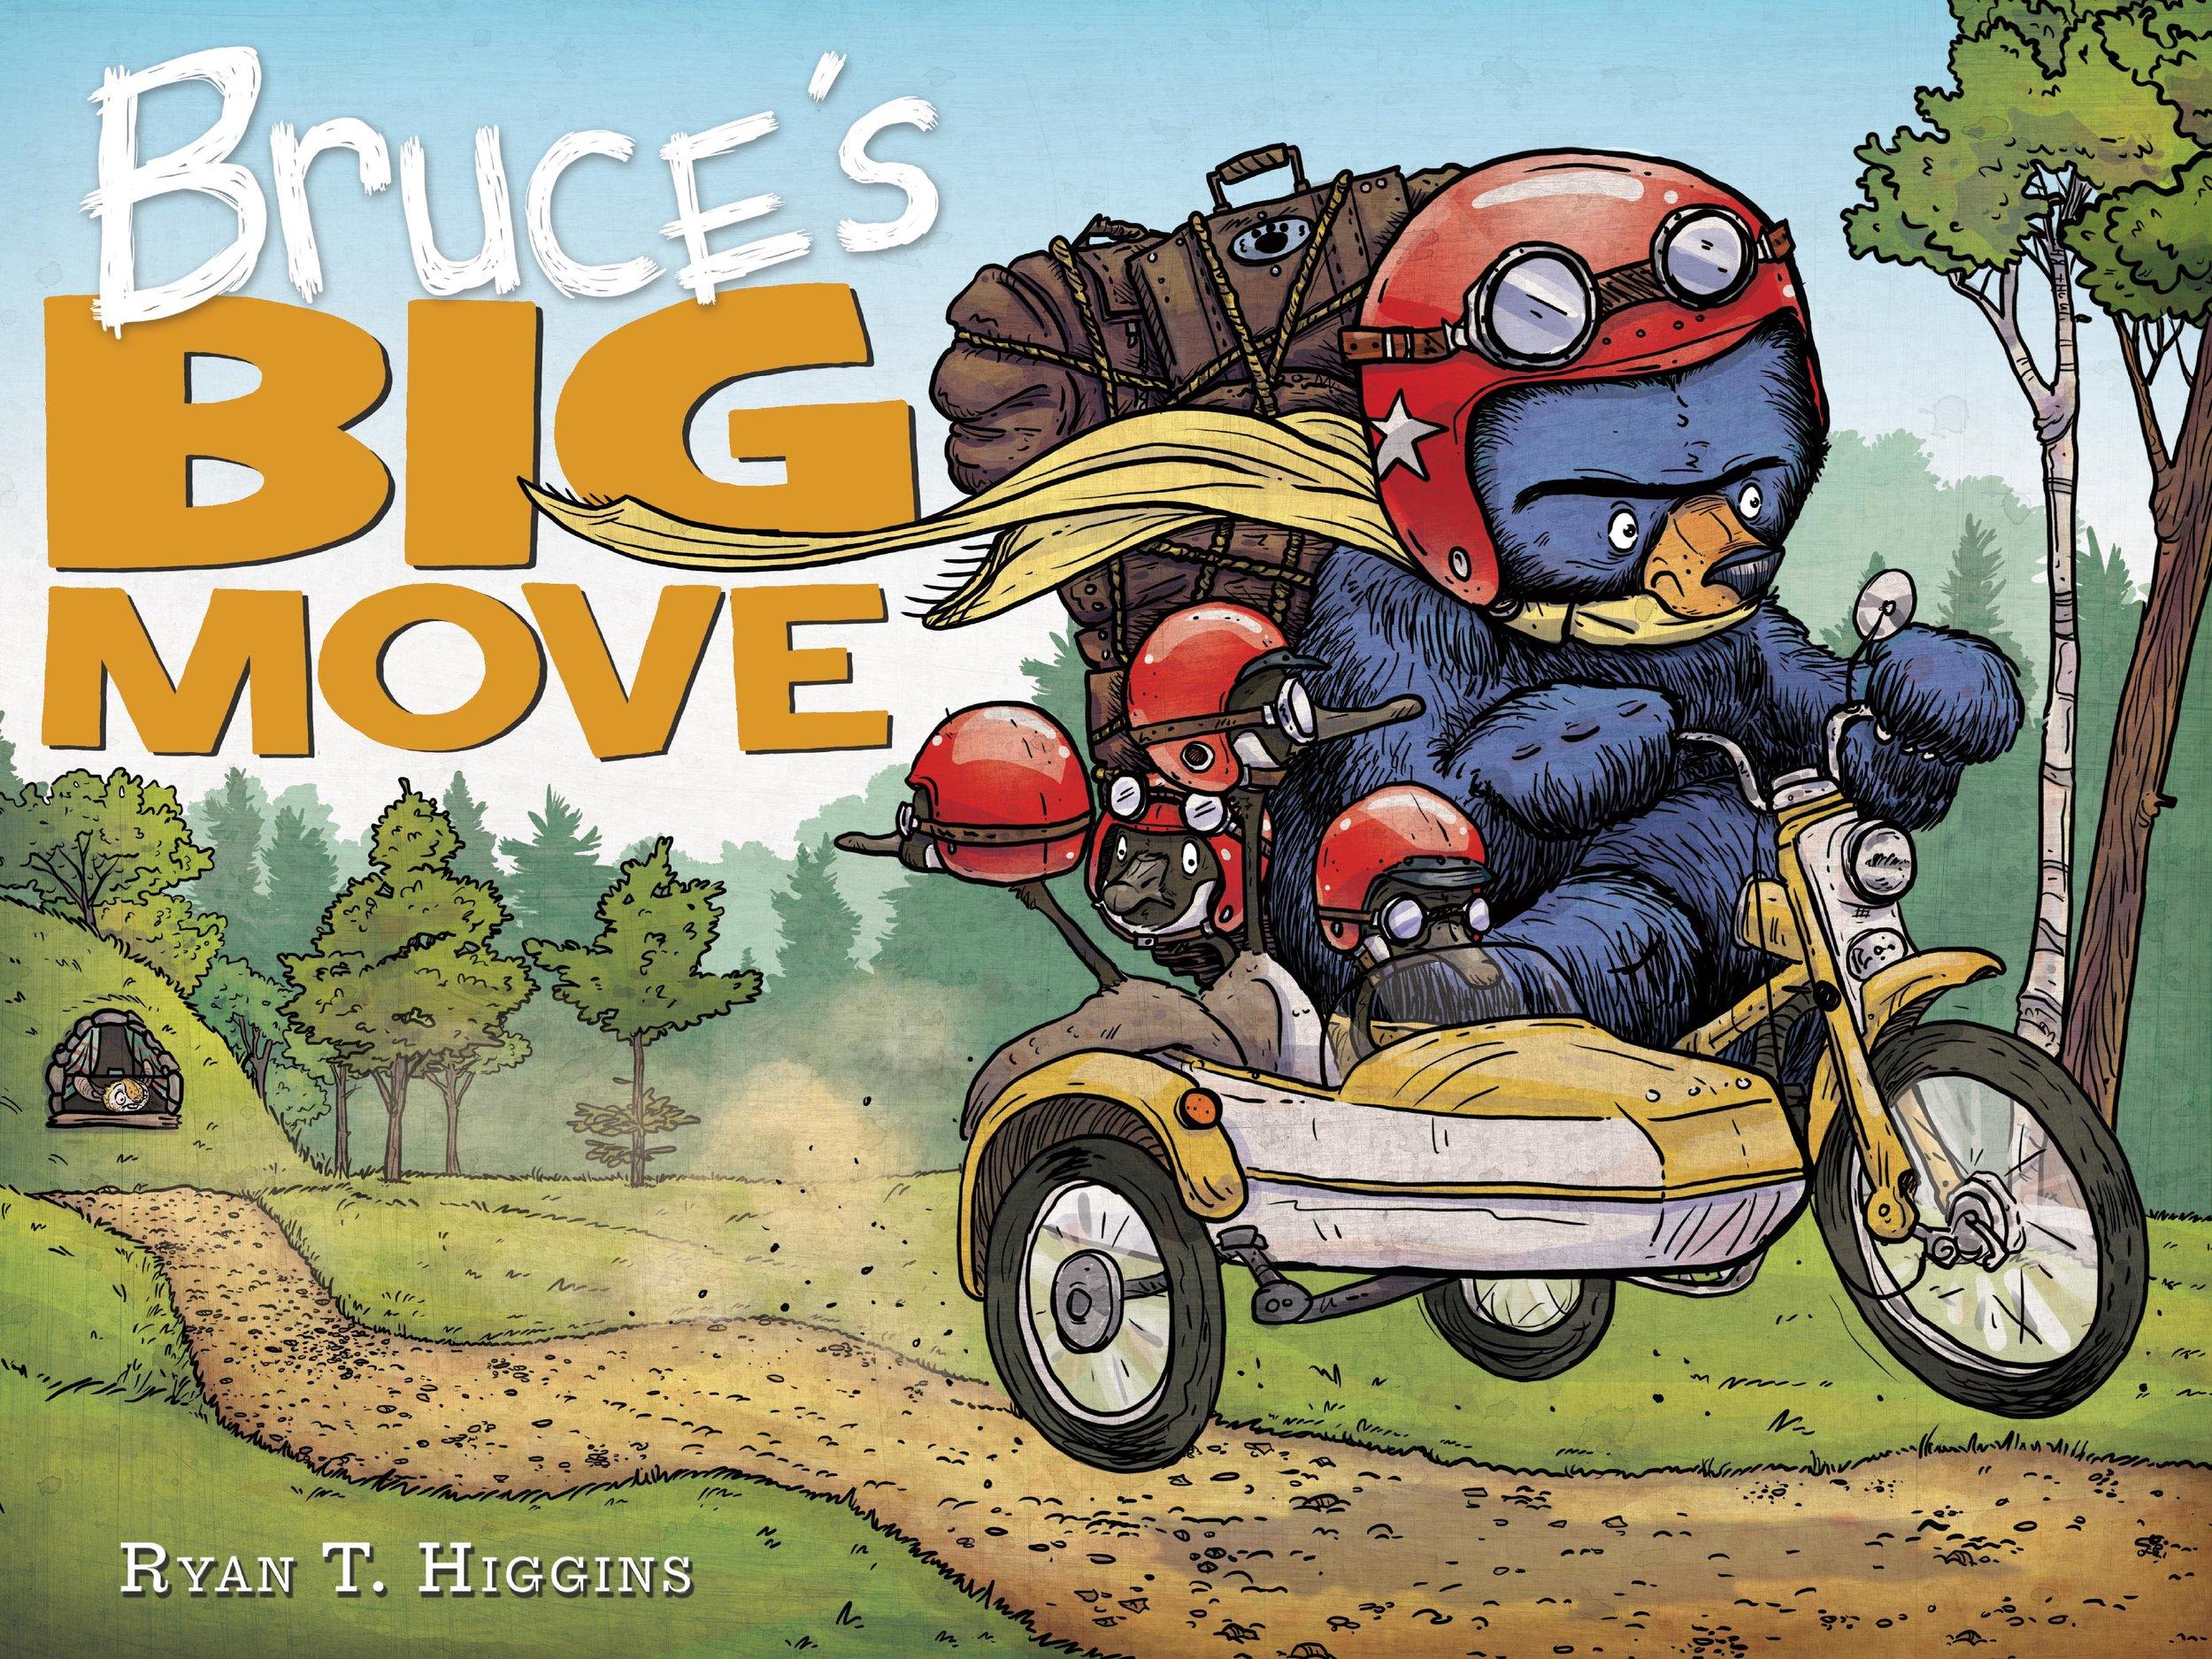 Higgins, Ryan T 2017_09 - BRUCE'S BIG MOVE - PB - RLM PR.jpg